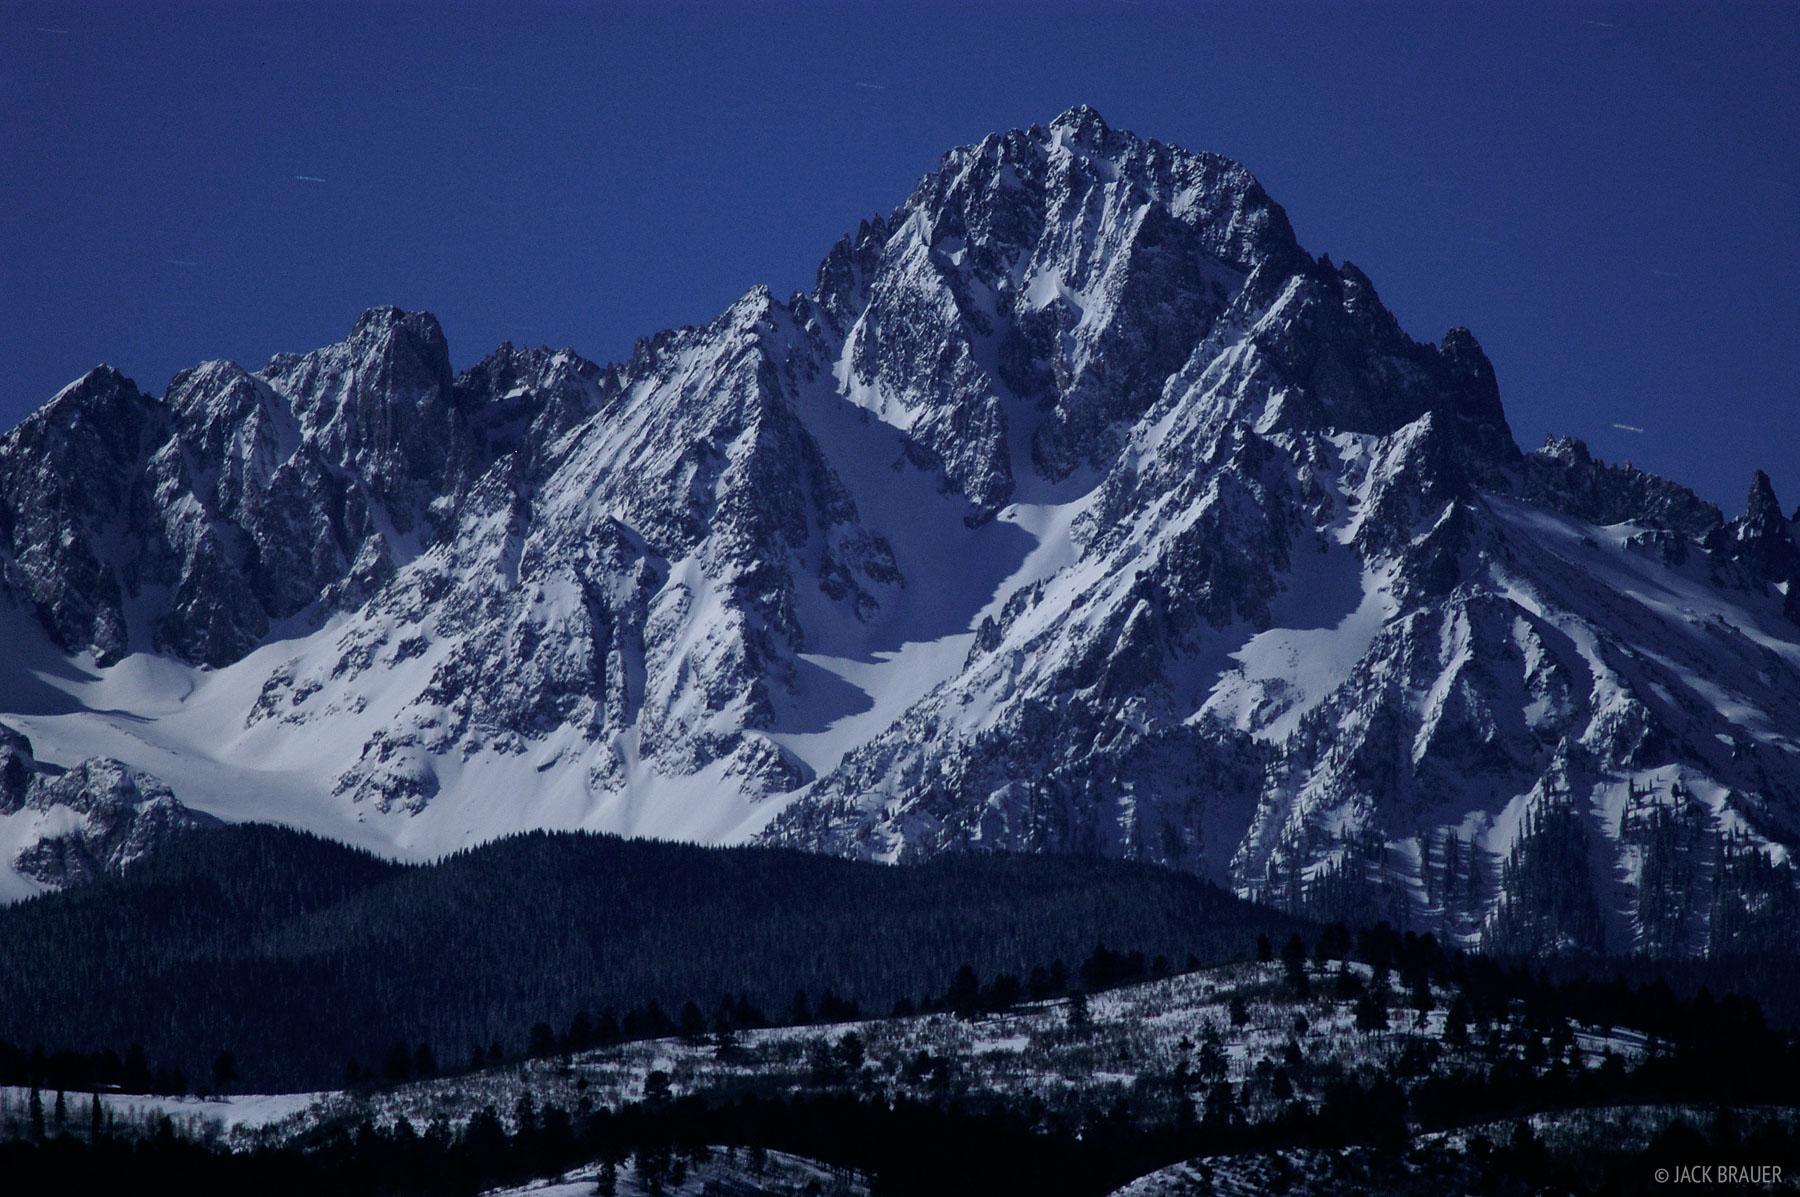 Mt. Sneffels, moonlight, San Juan Mountains, Colorado, photo